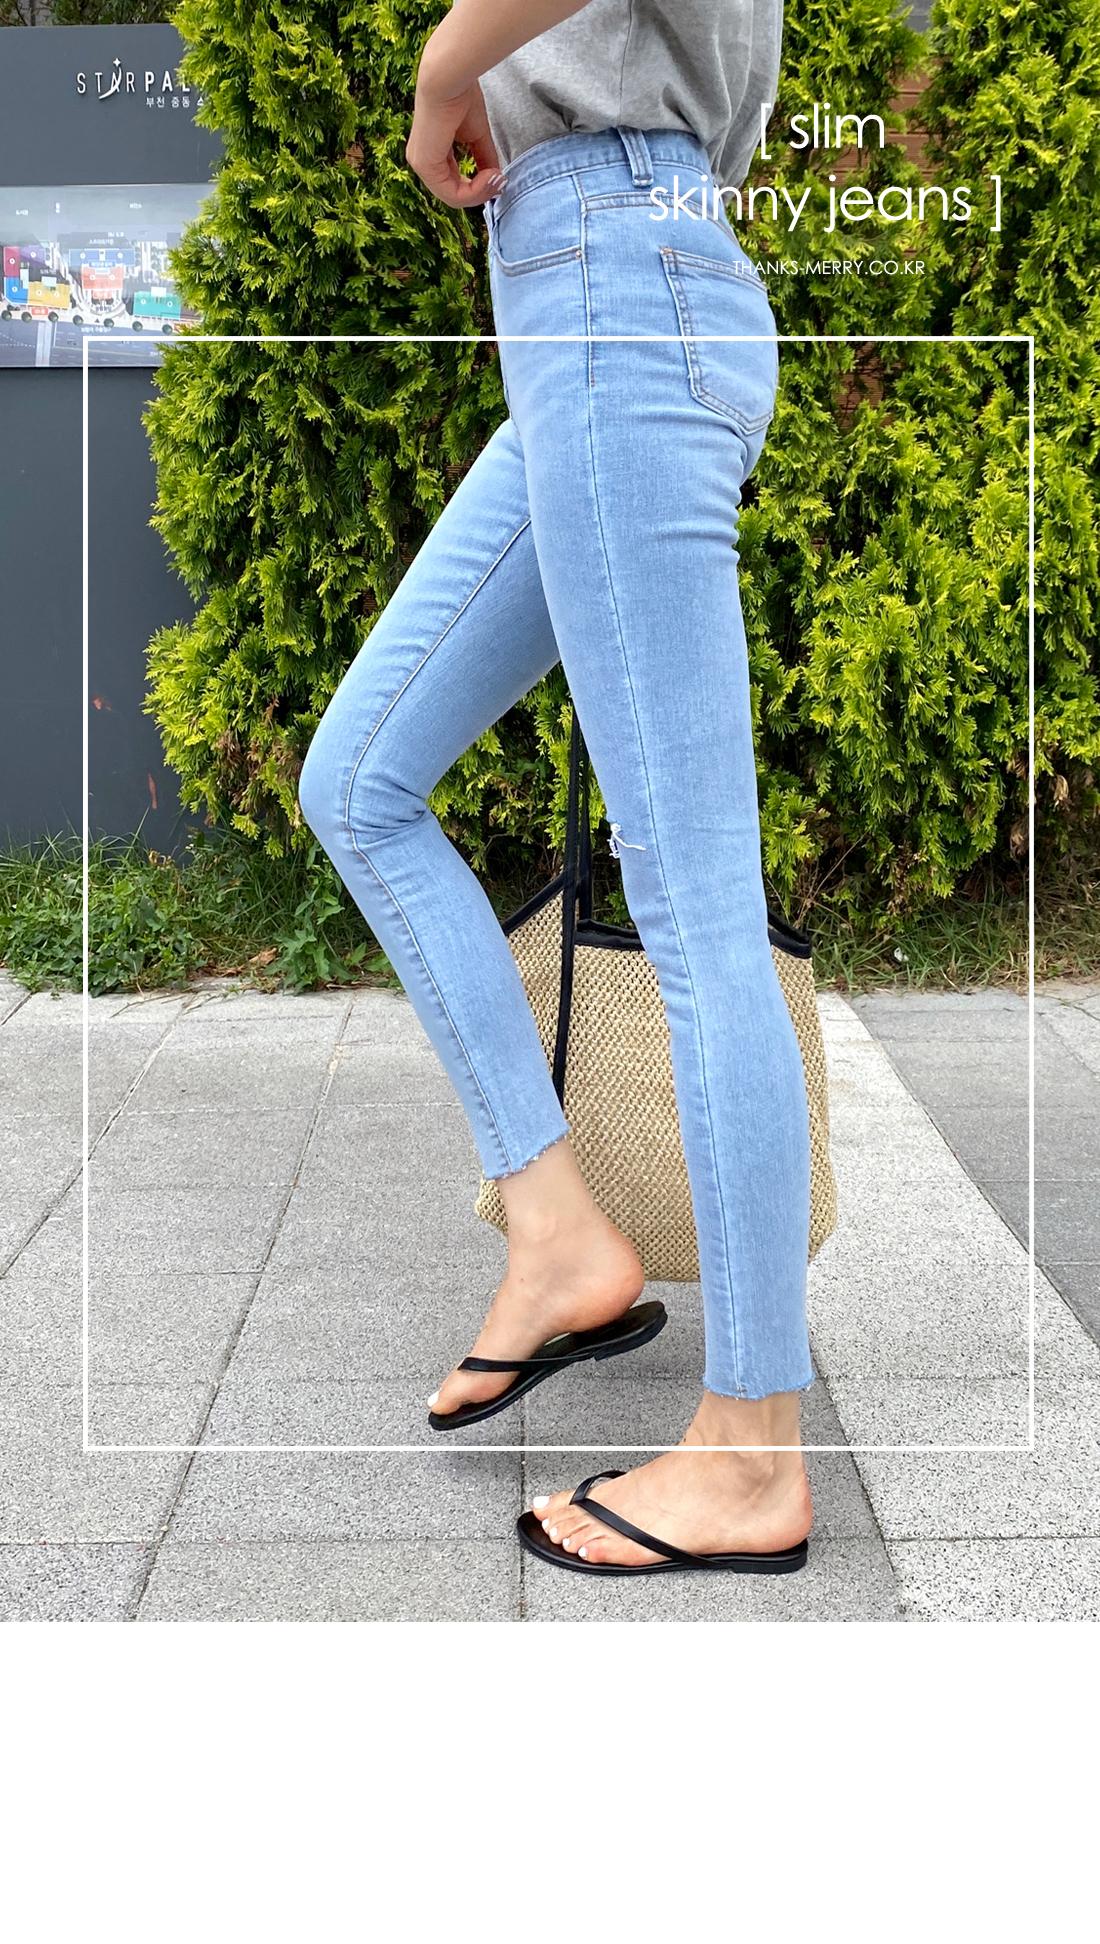 Knee Knife Vintage Light Blue Spandex Skinny Jeans